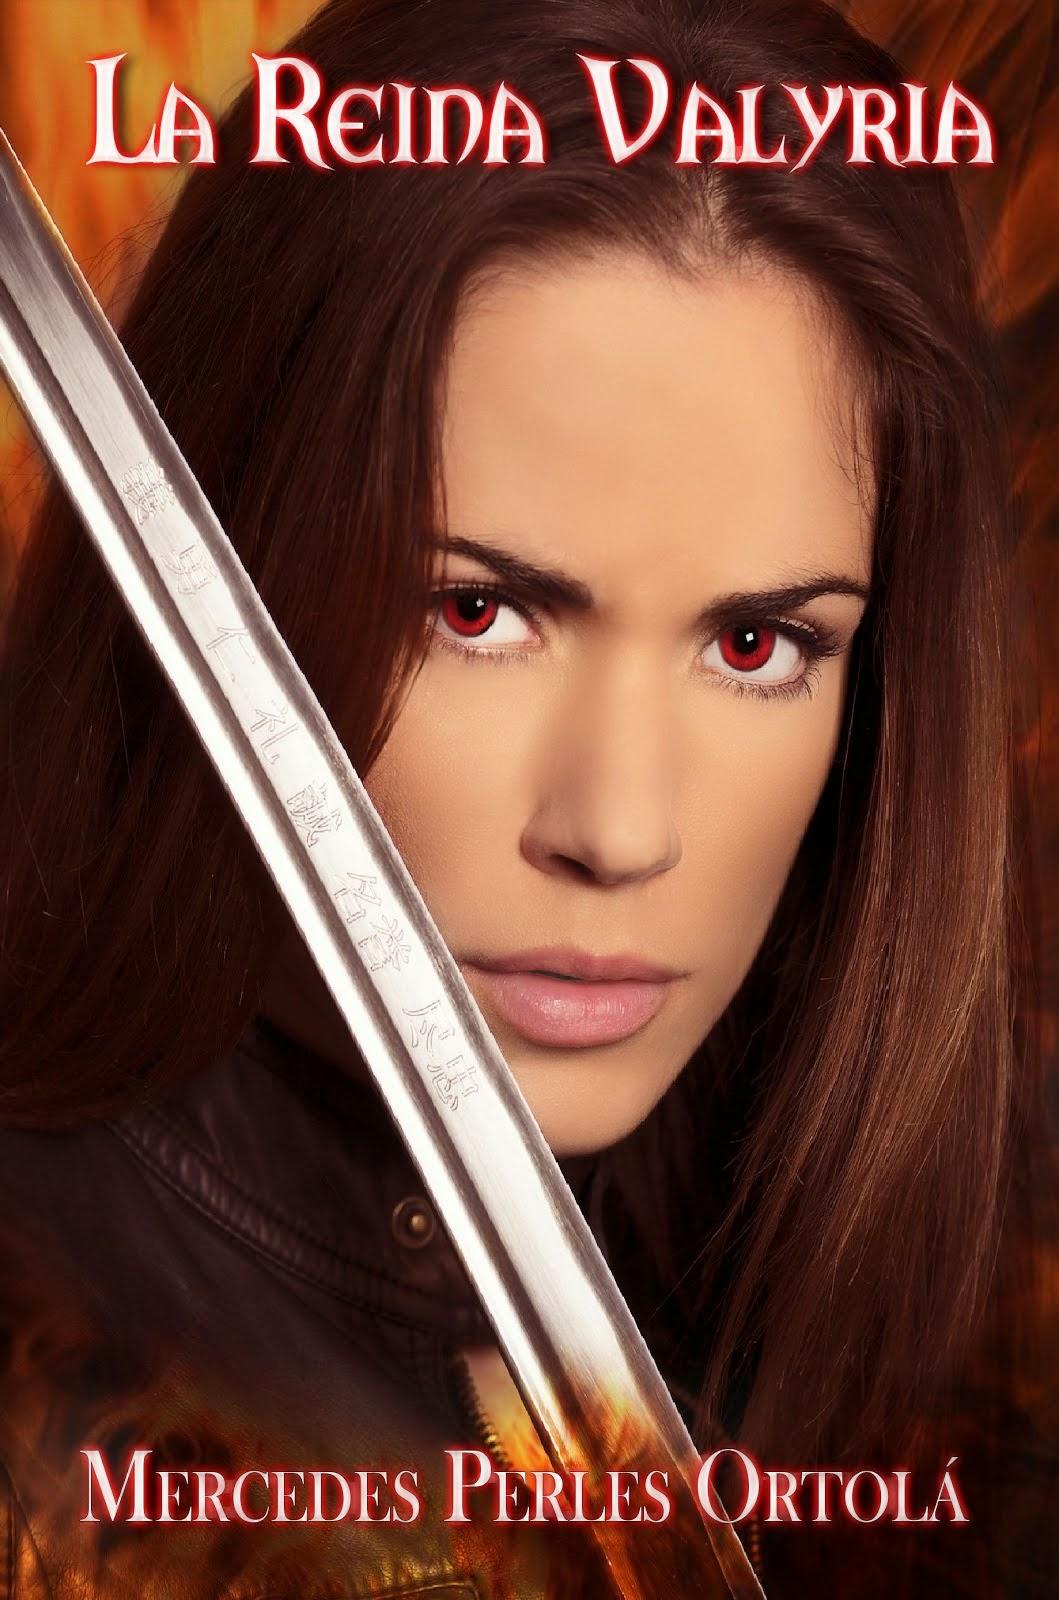 La Reina Valyria